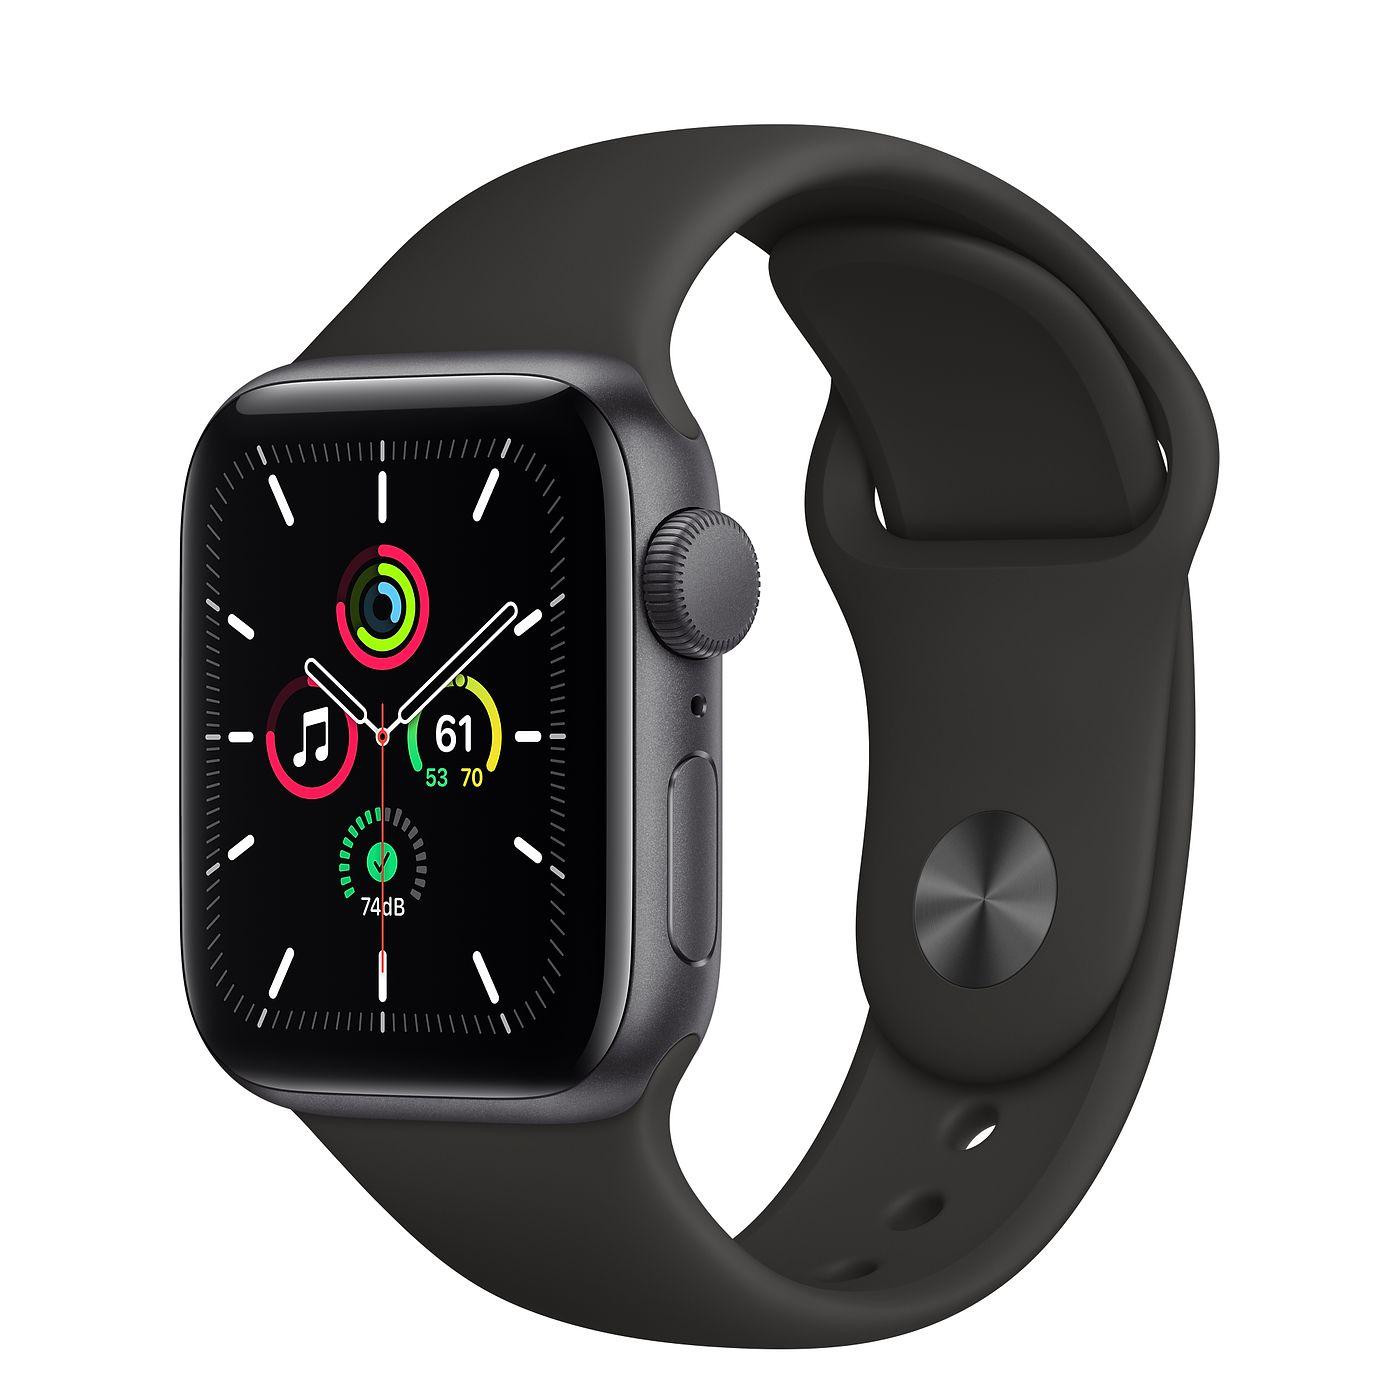 Apple 2020년 애플워치 SE, GPS, 스페이스 그레이 알루미늄 케이스, 블랙 스포츠 밴드